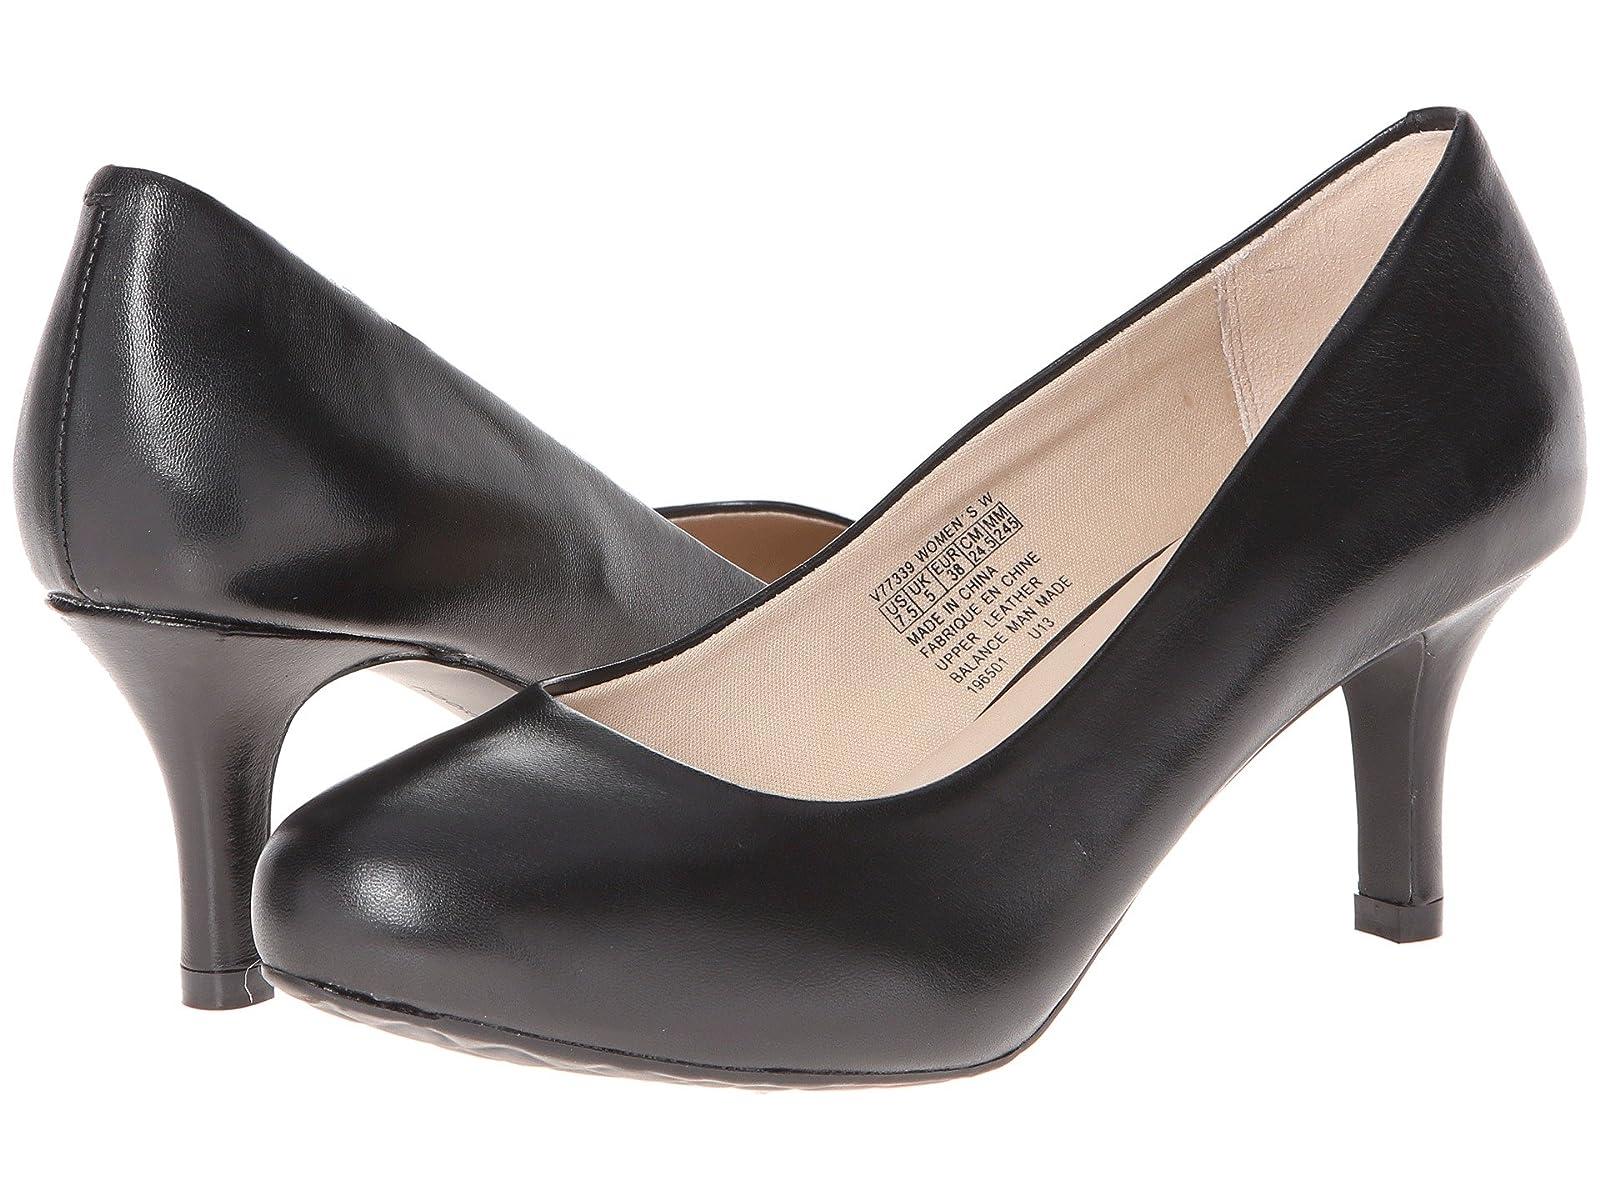 Rockport Seven to 7 Low PumpAtmospheric grades have affordable shoes